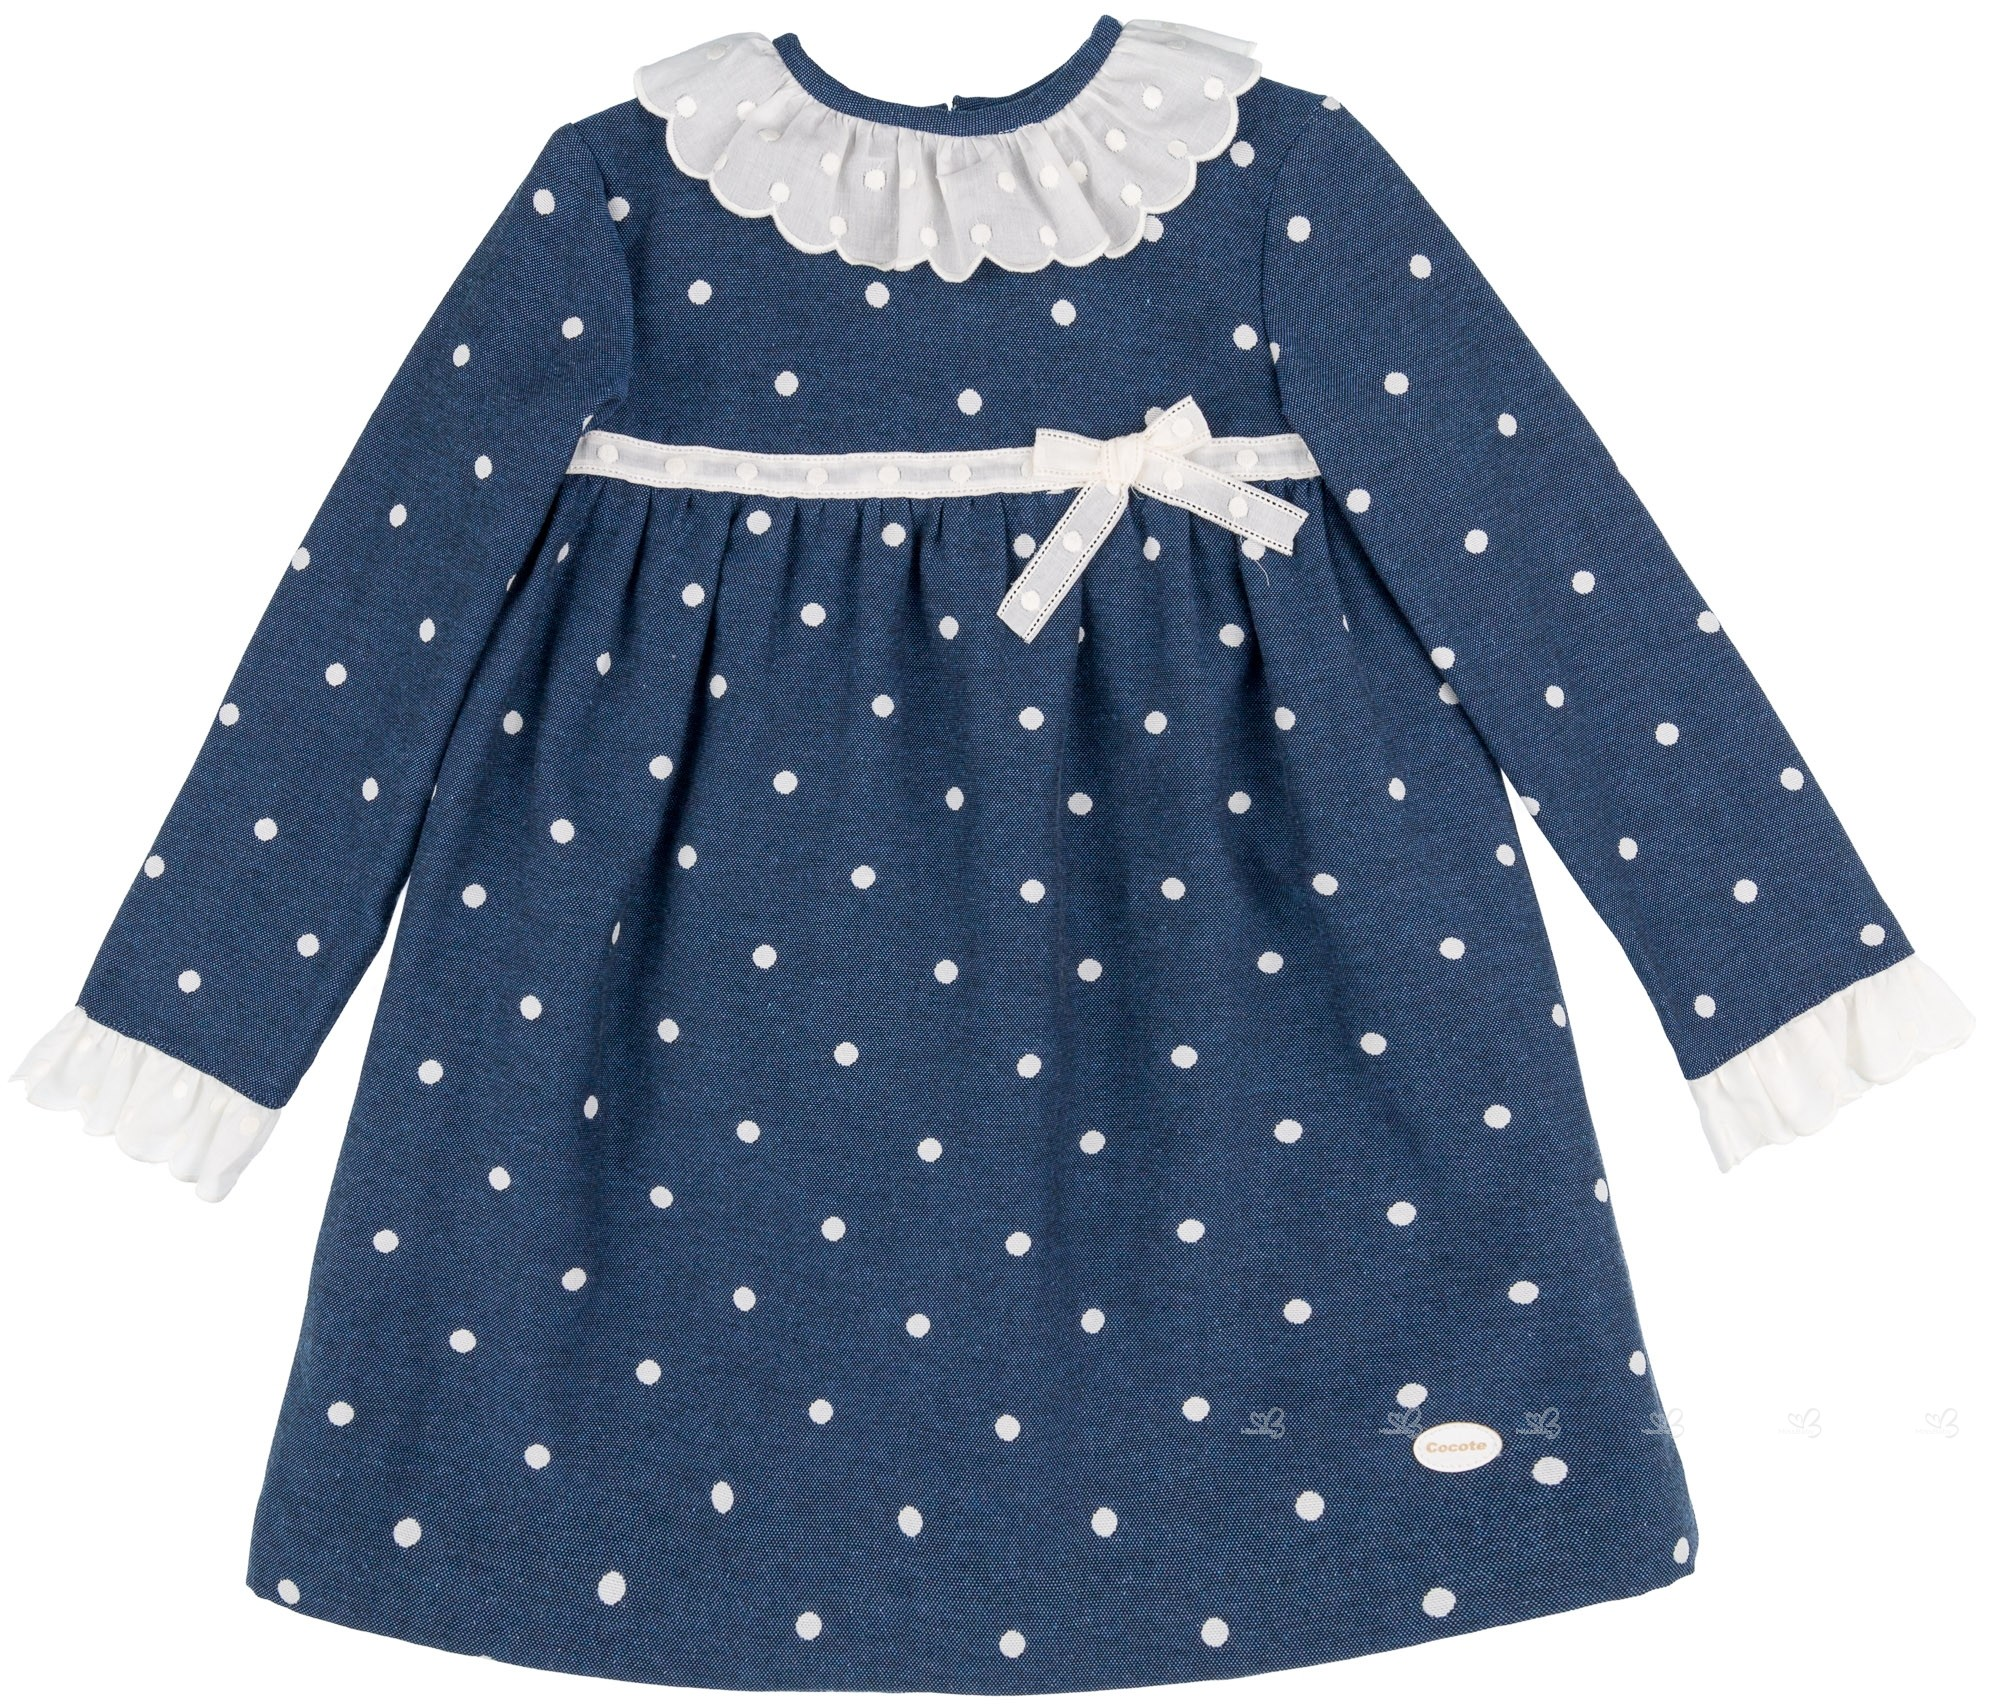 c7511eba9413 Cocote Girls Navy Blue Polka Dot Dress